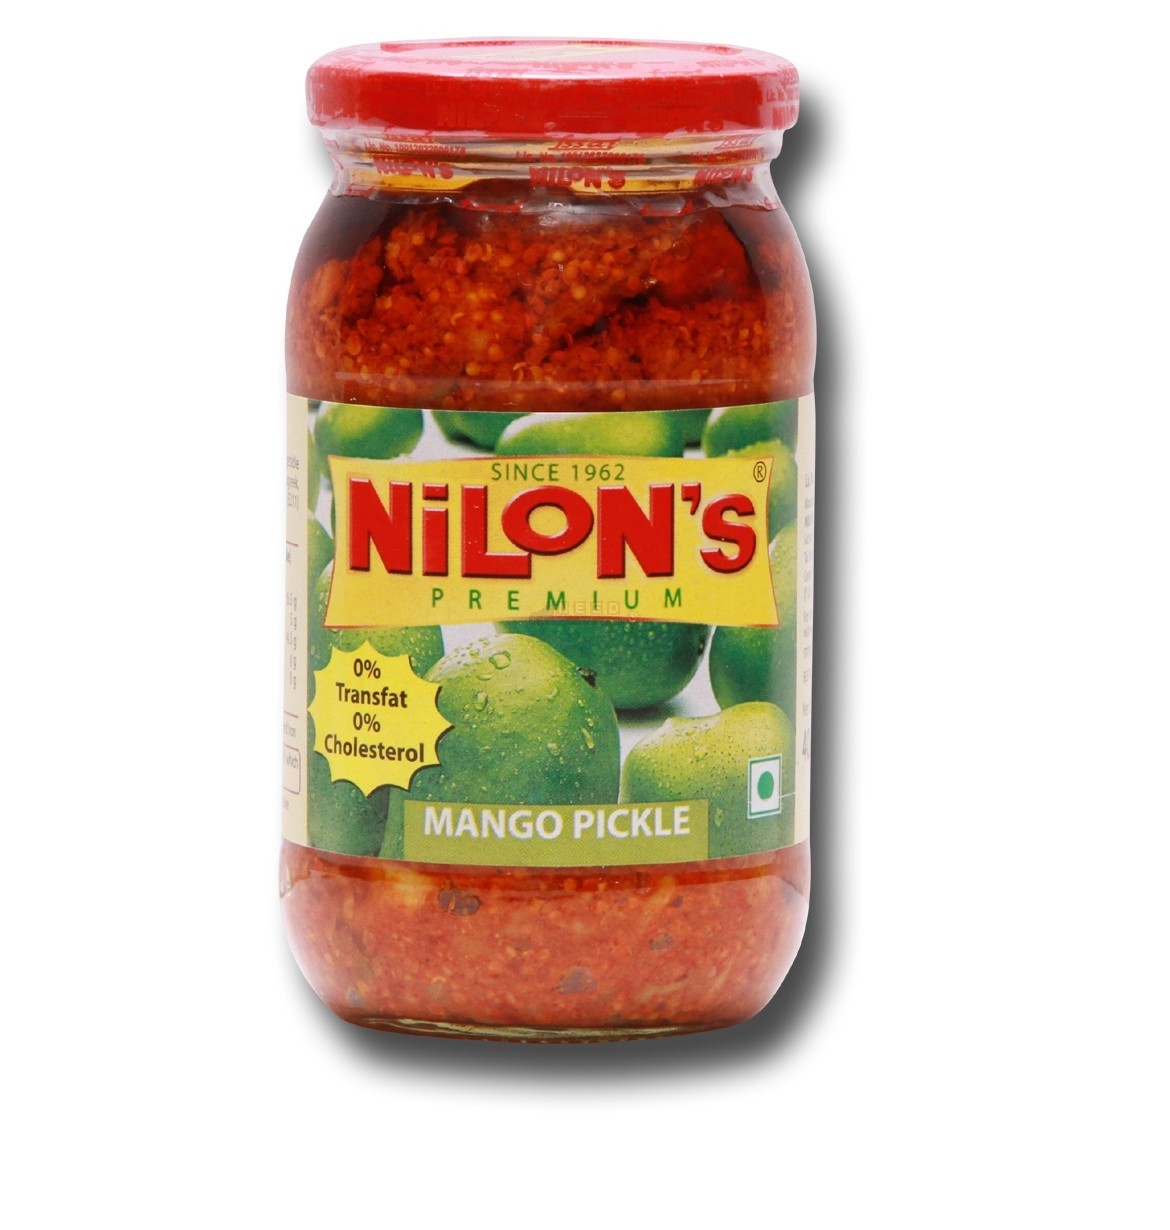 Nilons Pickle Image